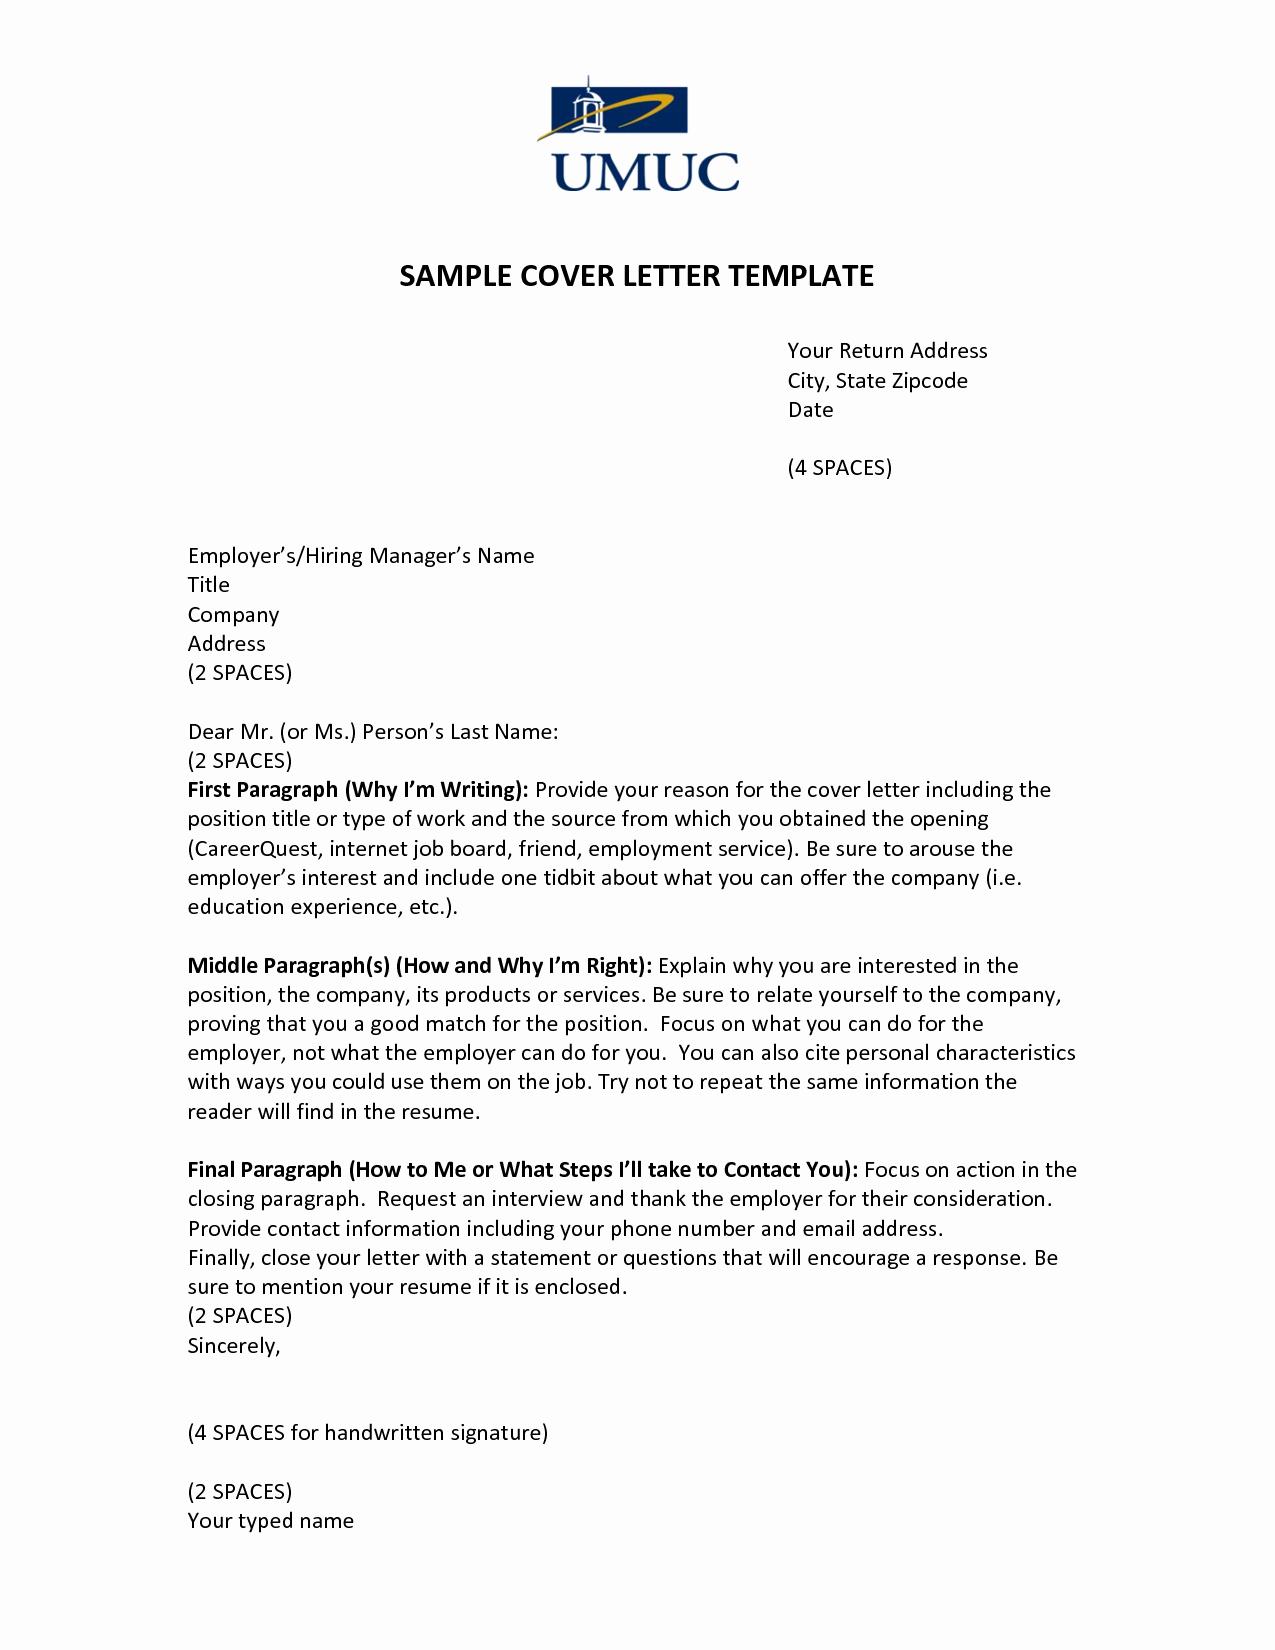 Community Service Letter Template - Munity Service Letter Re Mendation Fresh Elegant Cover